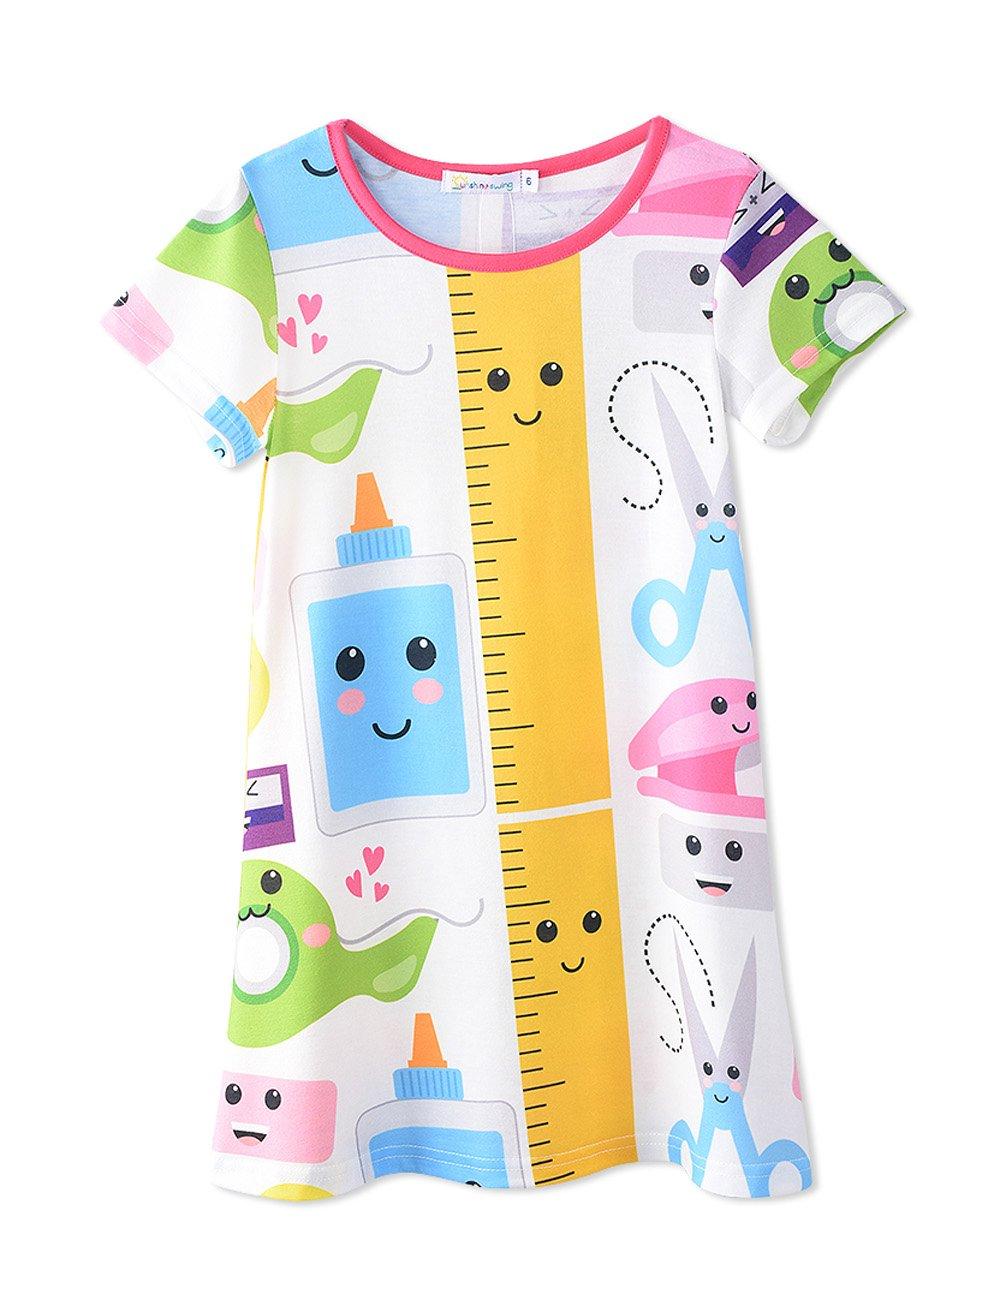 Girl's Kids Summer Round Neck Short Sleeve Smile Cartoon Casual Tunic T-Shirt Dress 8T